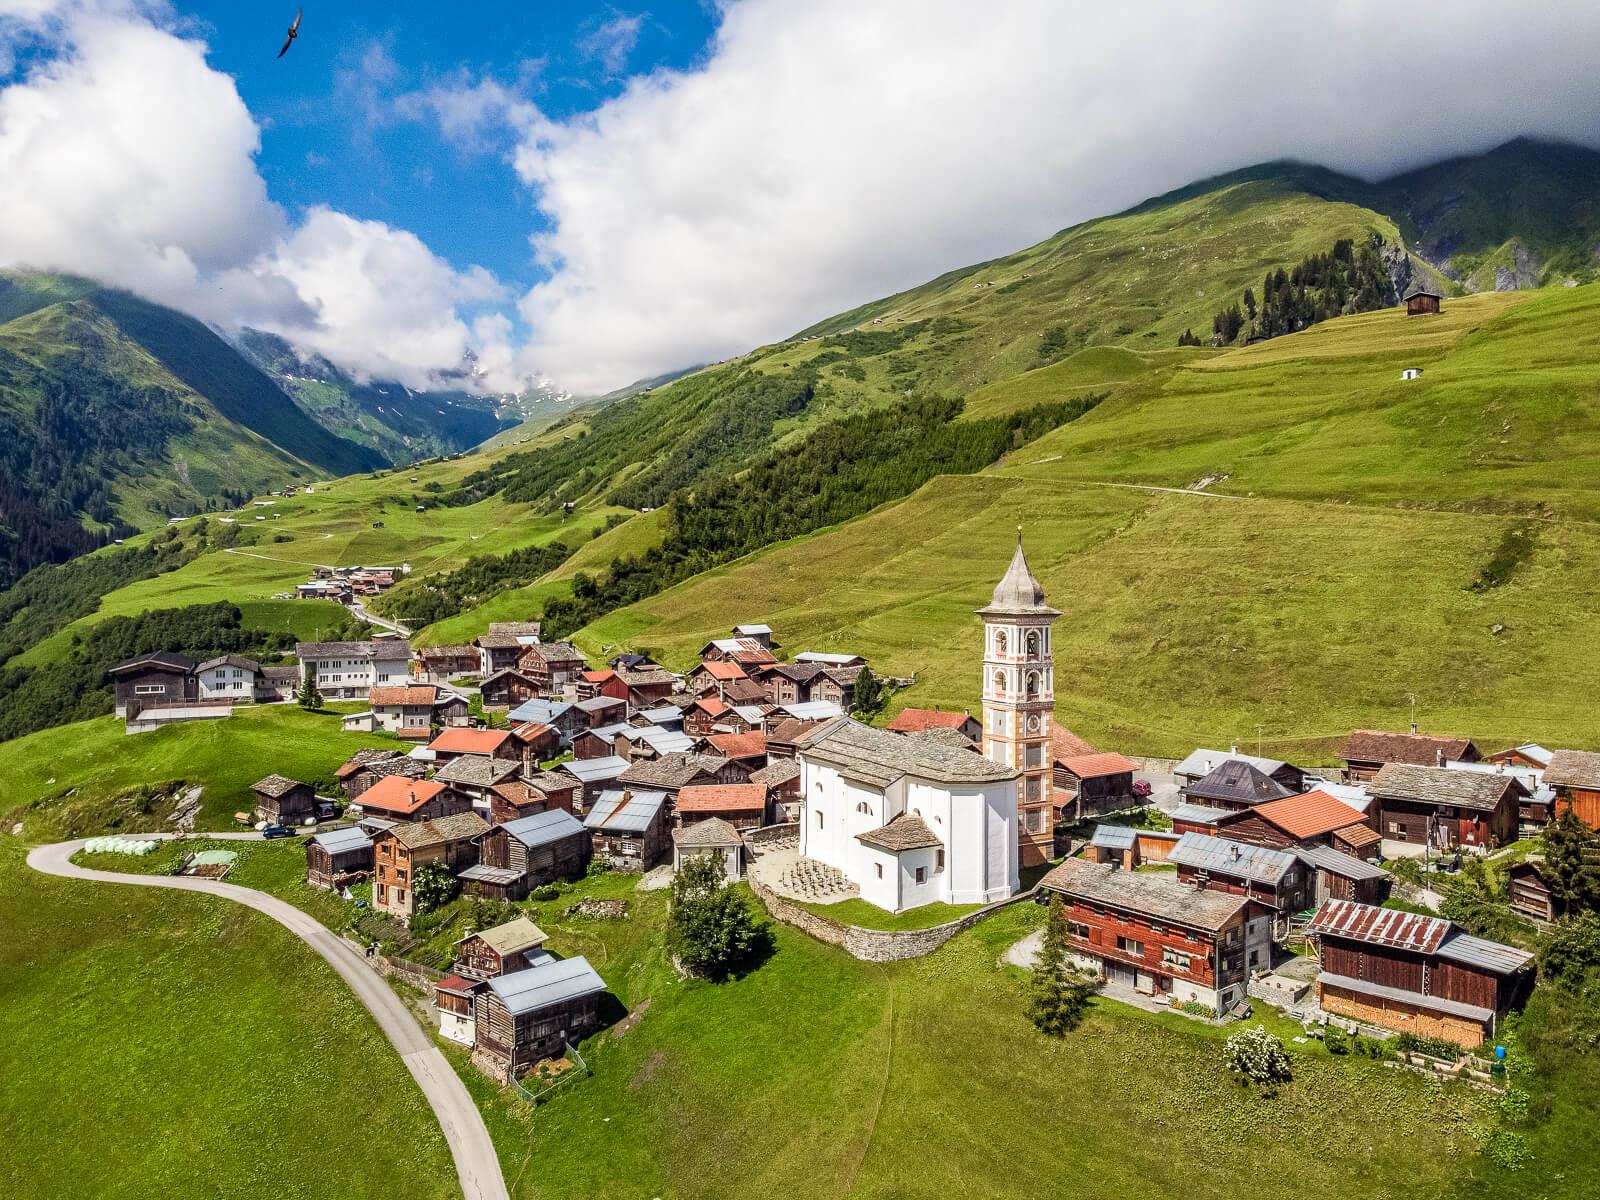 Stiva da morts in Vrin, Switzerland